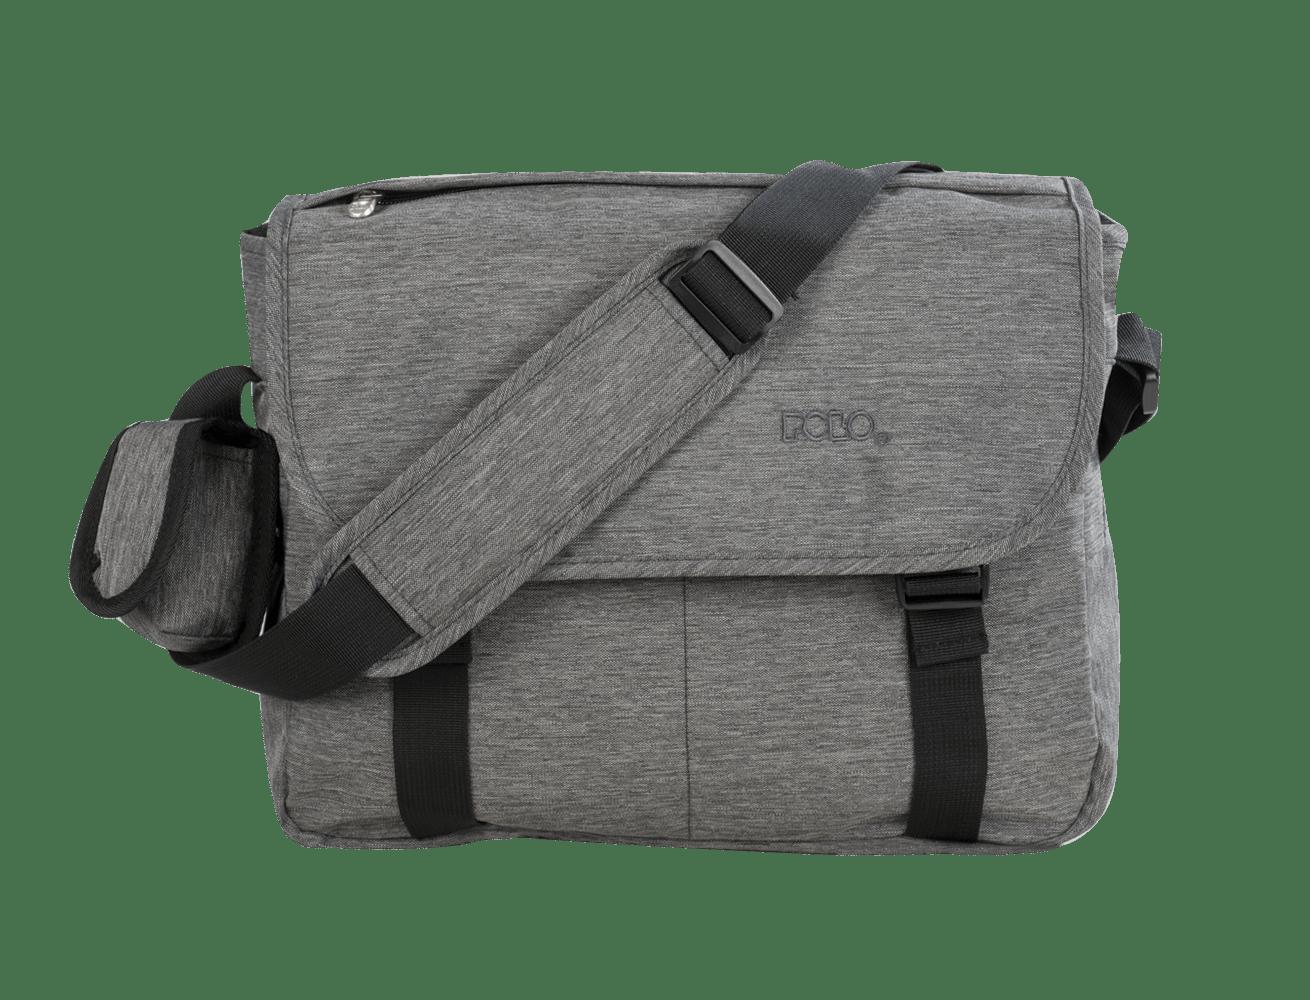 5f6f274367 Τσάντα Polo Briefcase Χαρτοφύλακας - 9-07-718-90 - Lexicon Shop